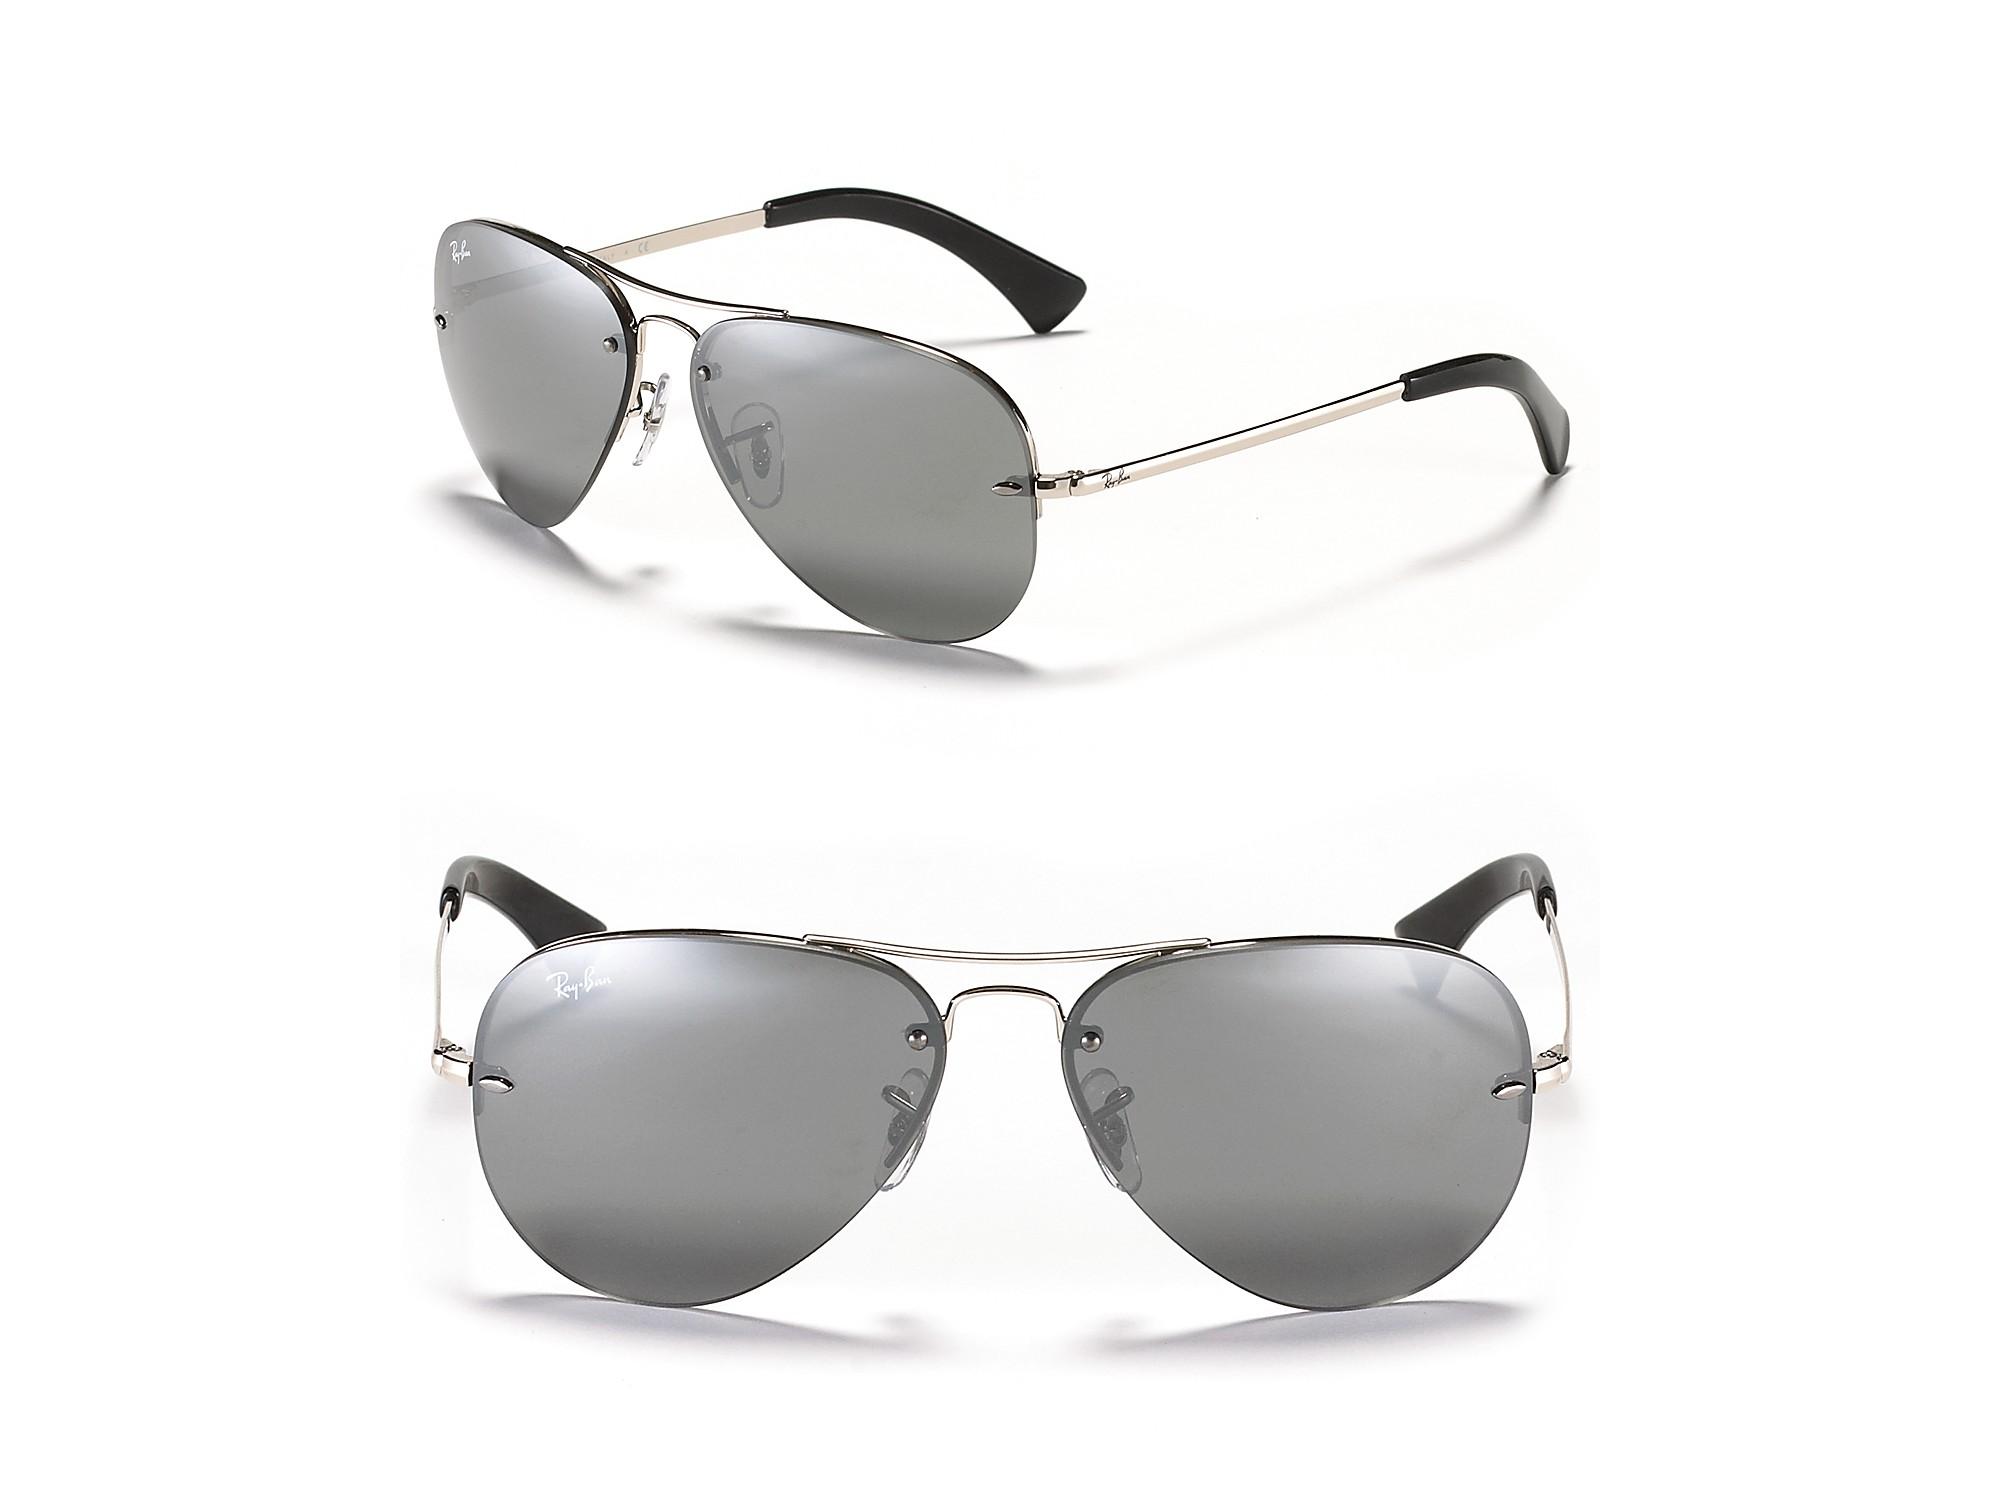 Rimless Glasses Ray Ban : Mens Ray Ban Rimless Eyeglasses www.tapdance.org